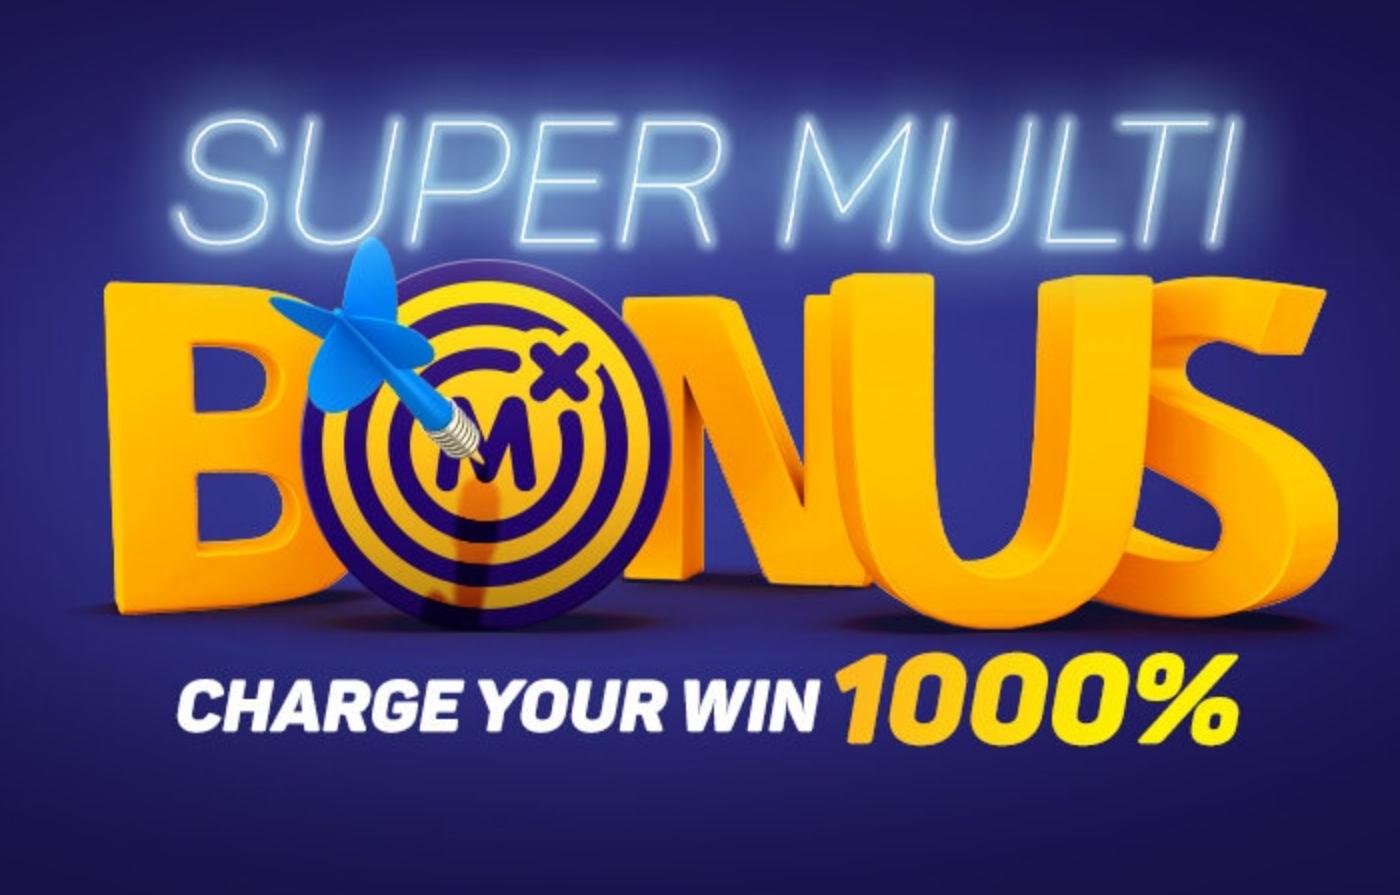 Bonus offers at Mozzart Bet in Kenya